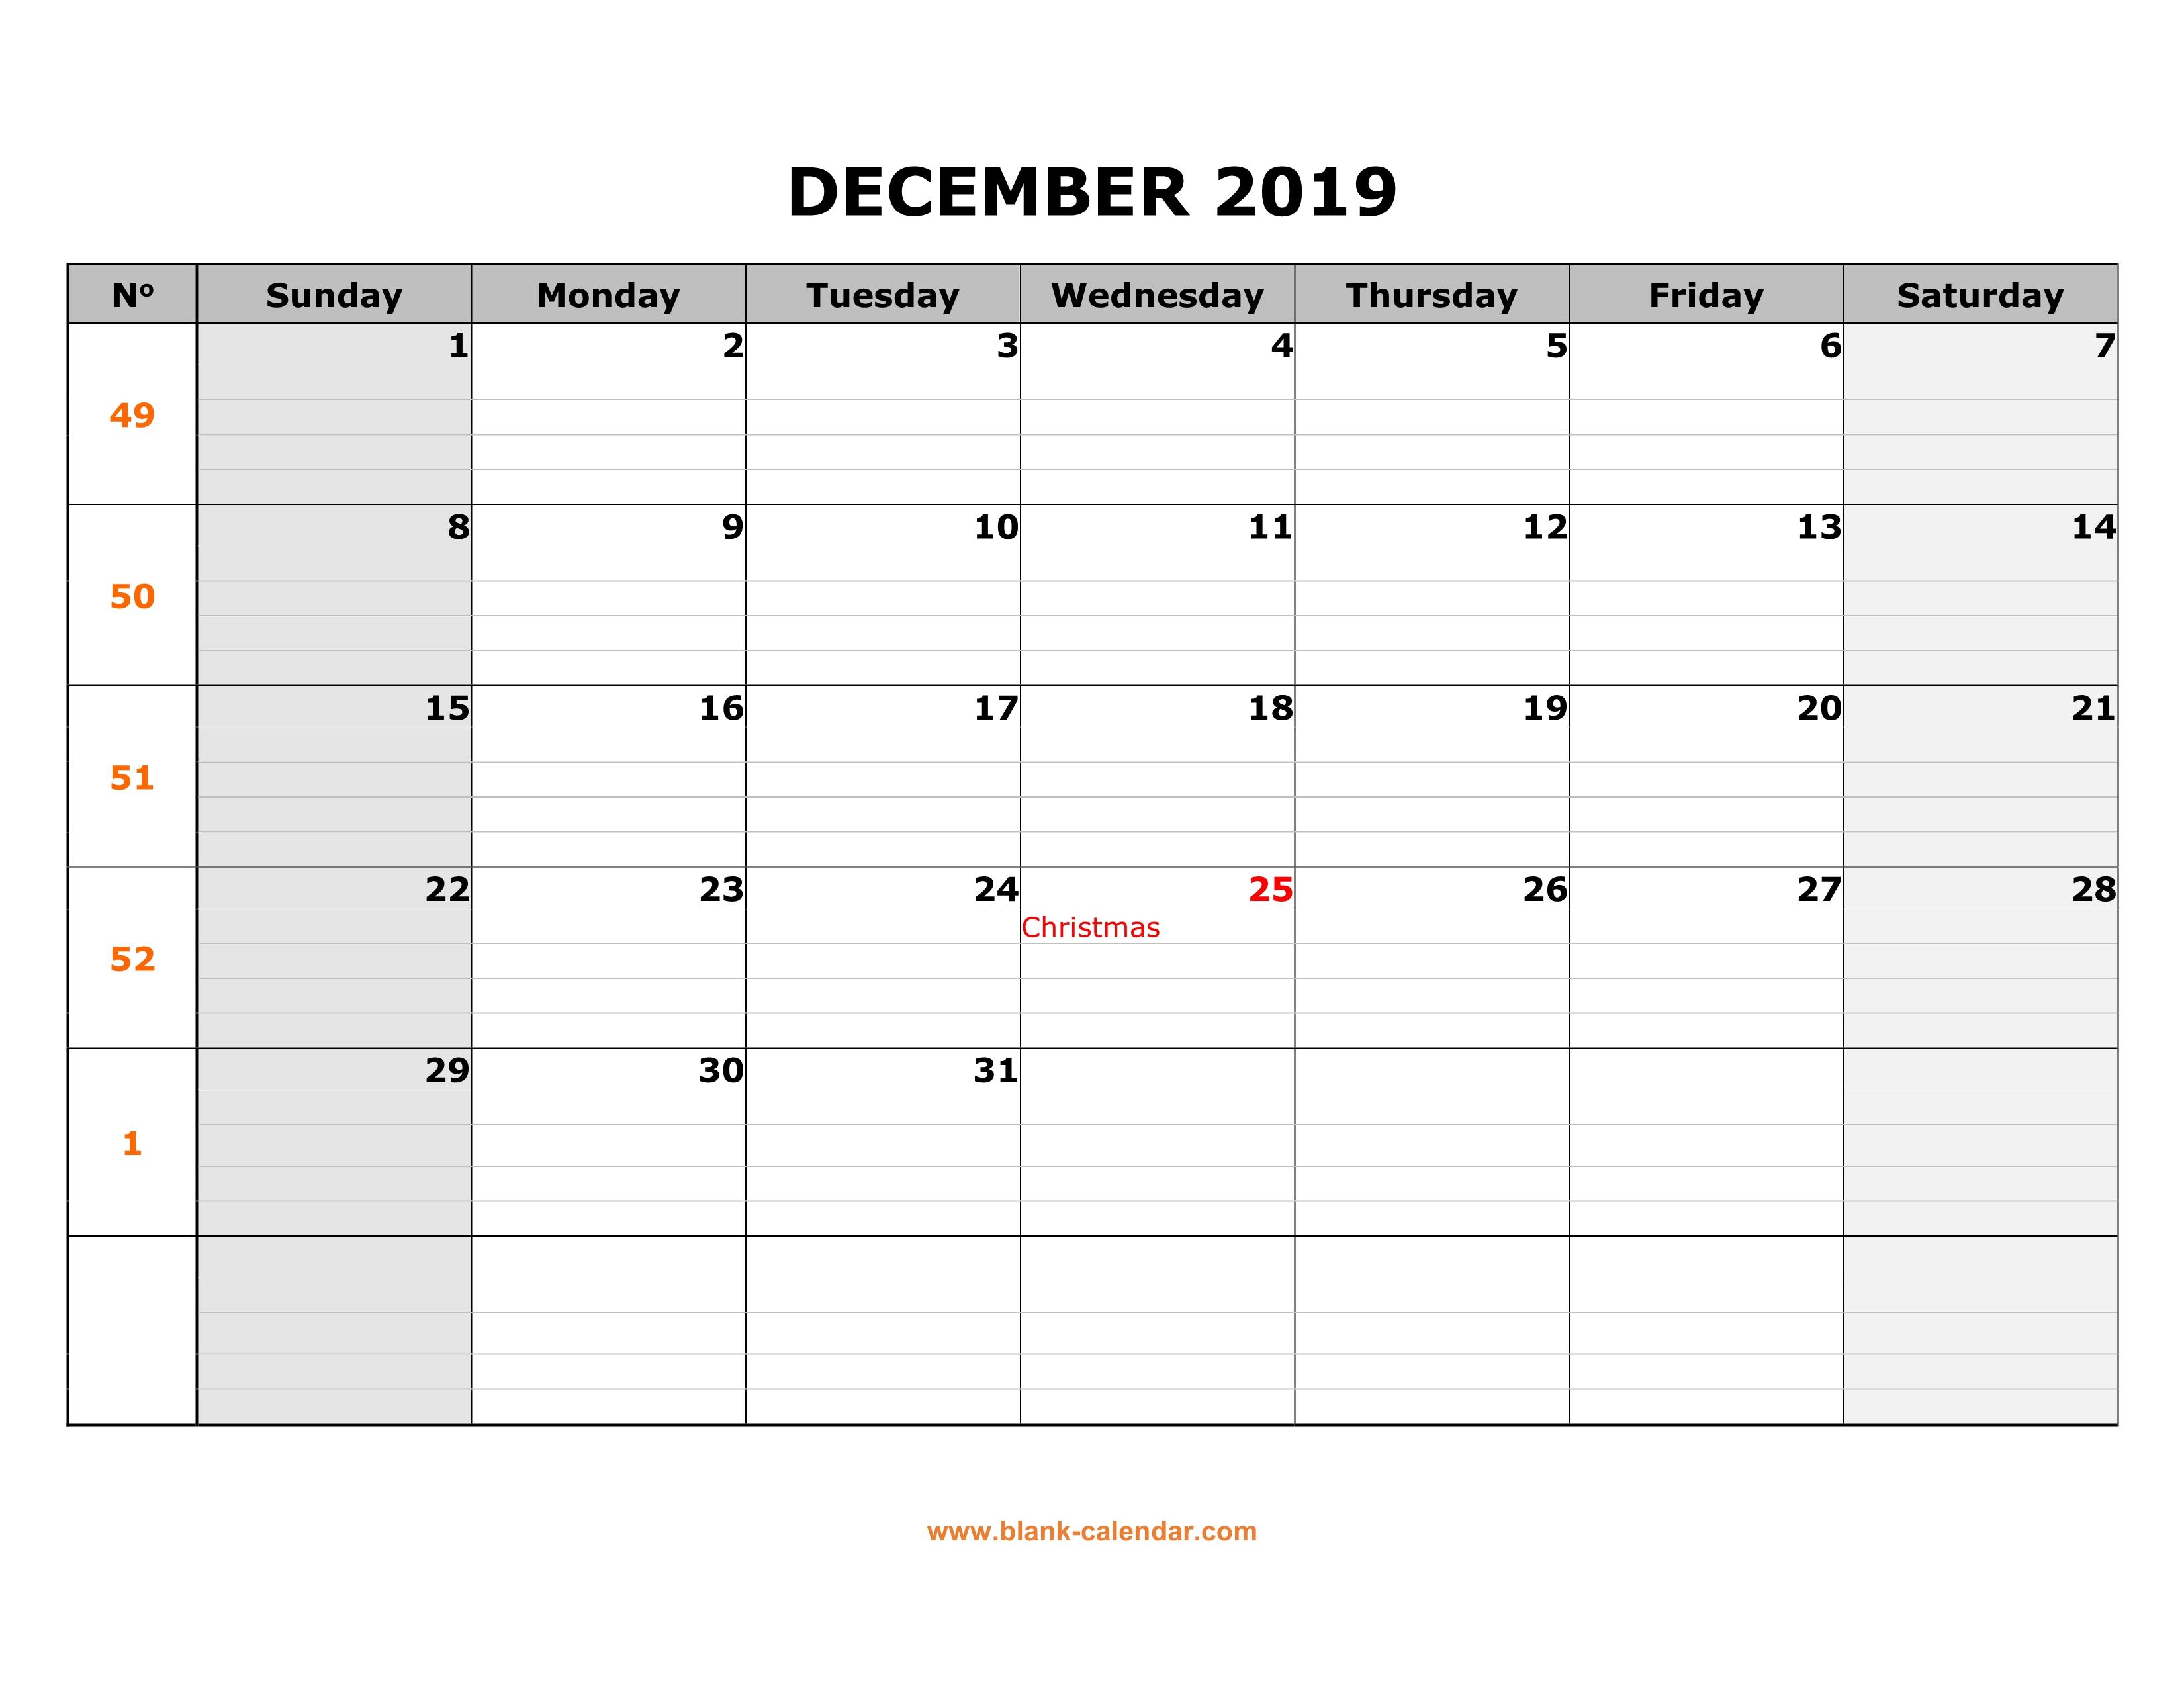 December 2019 Large Printable Calendar Free Download Printable December 2019 Calendar, large box grid